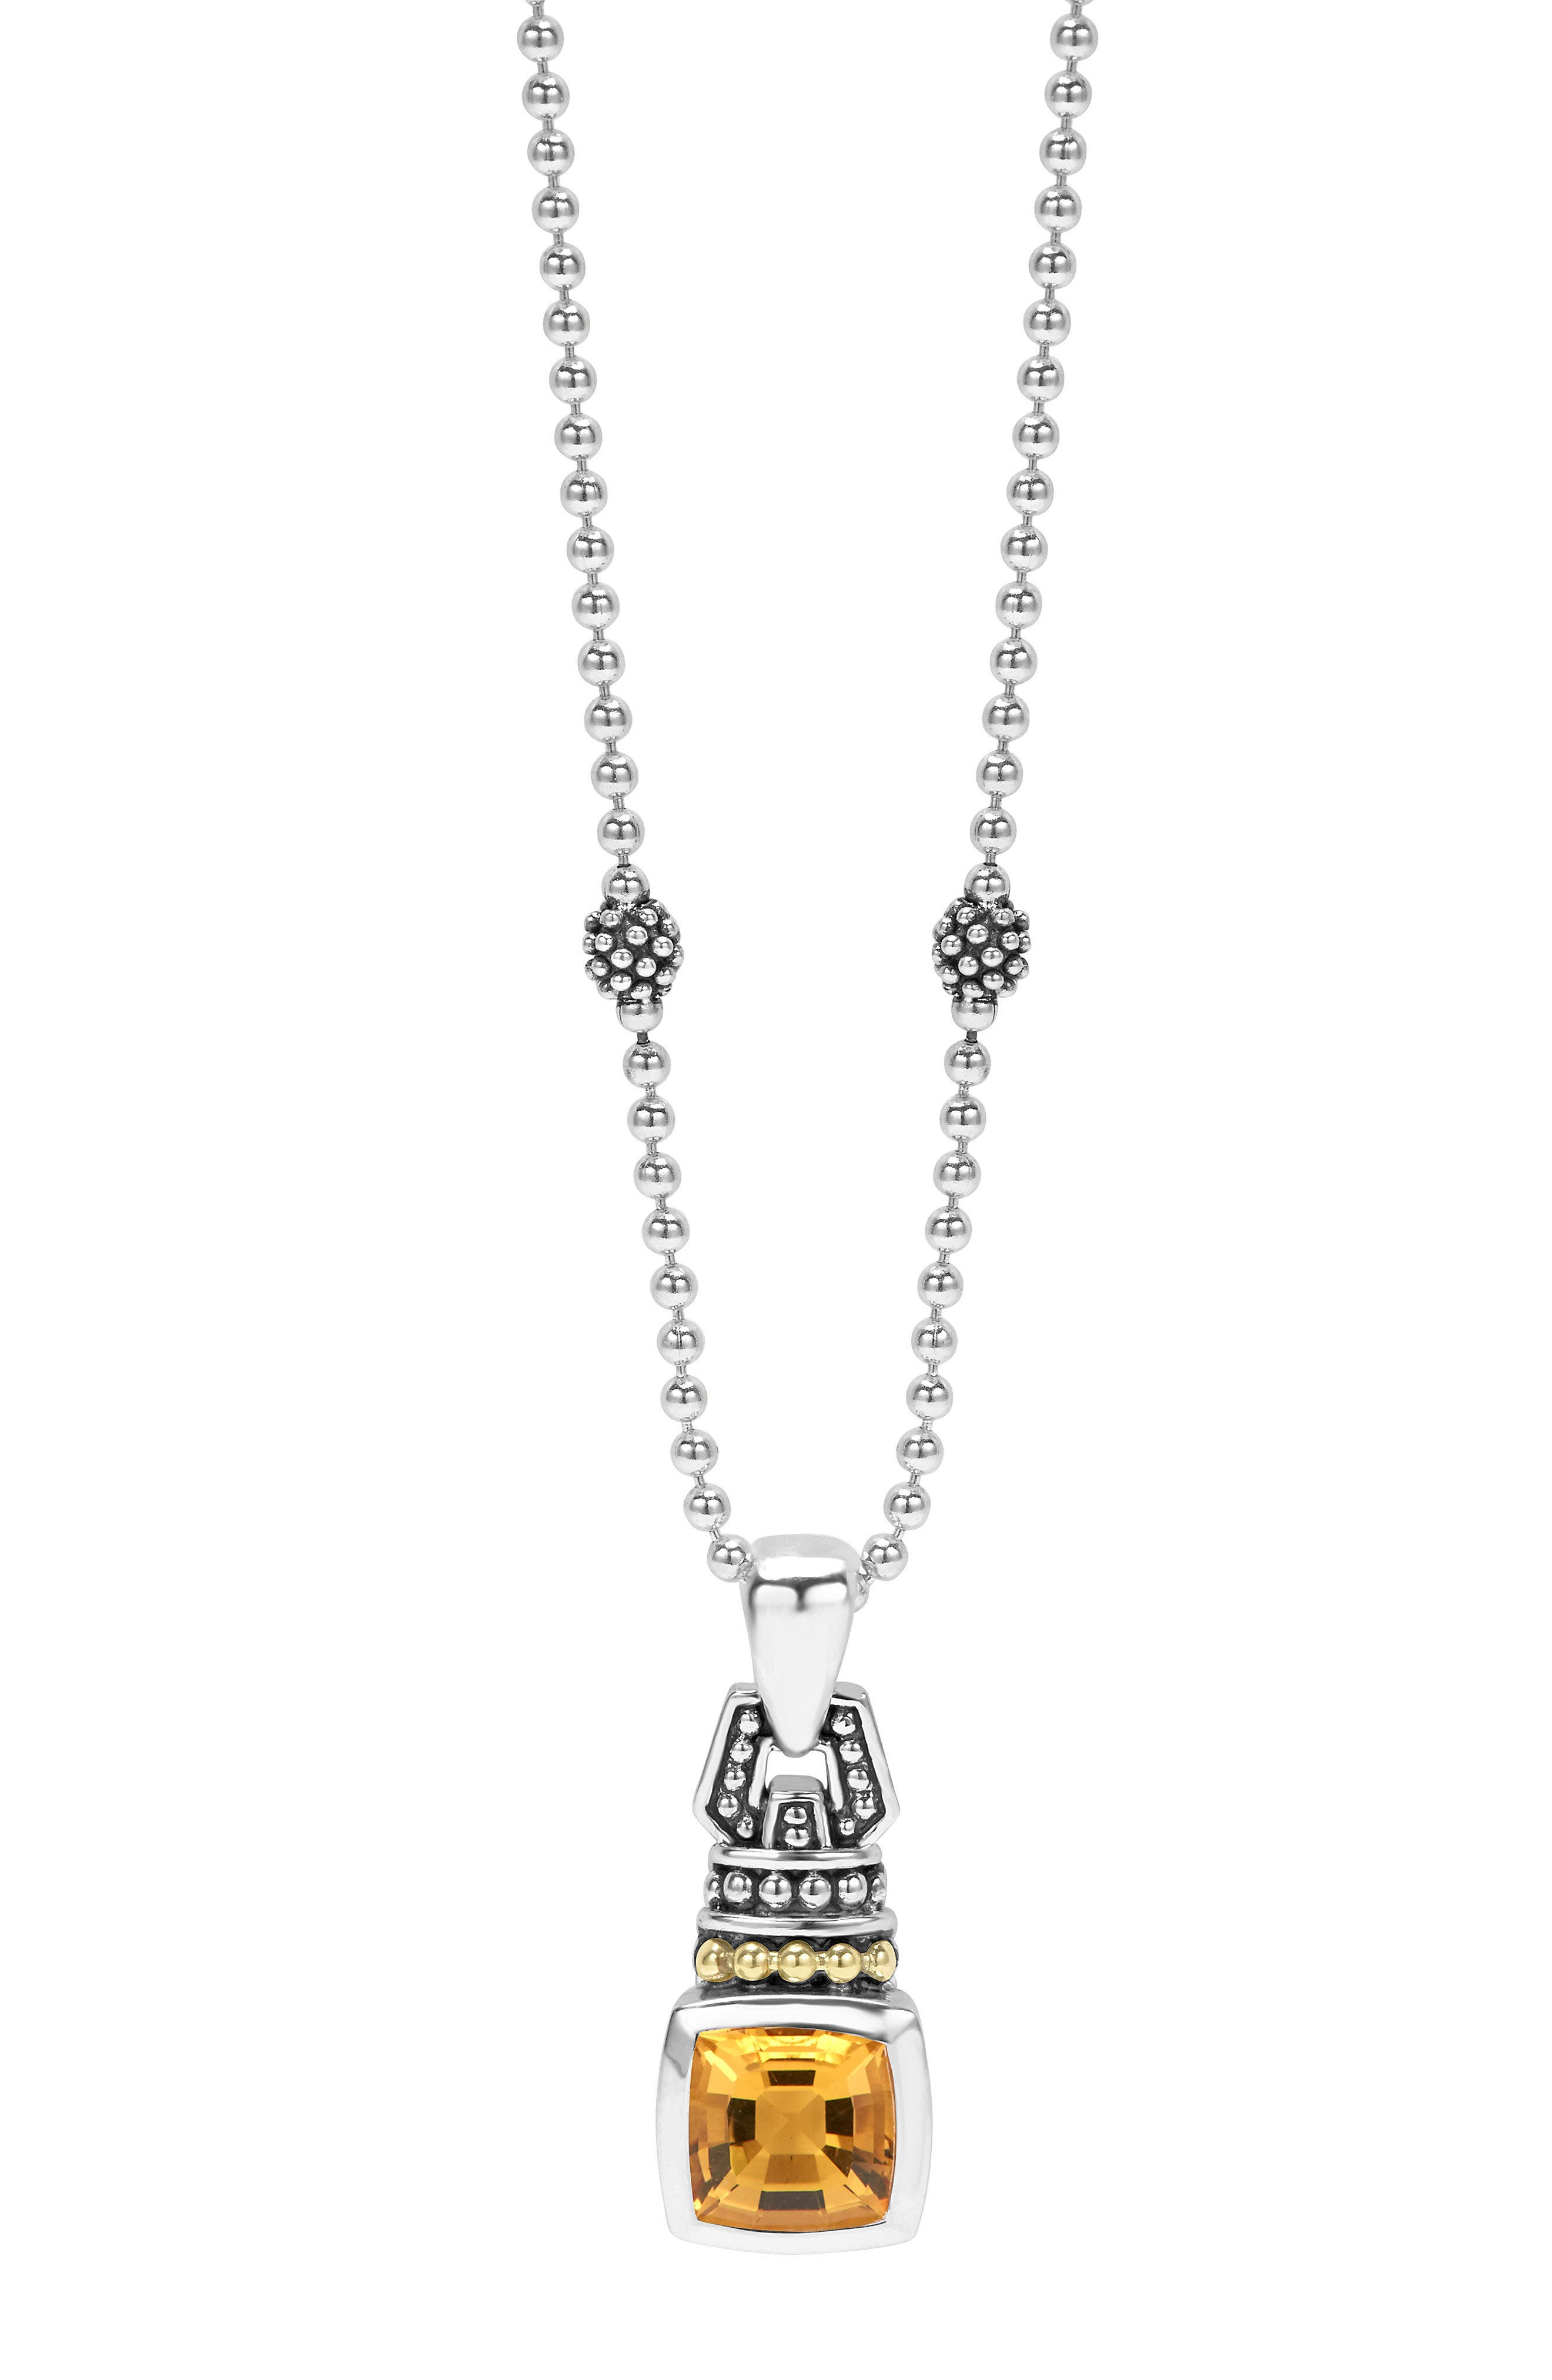 LAGOS 'Caviar Color' Pendant Necklace